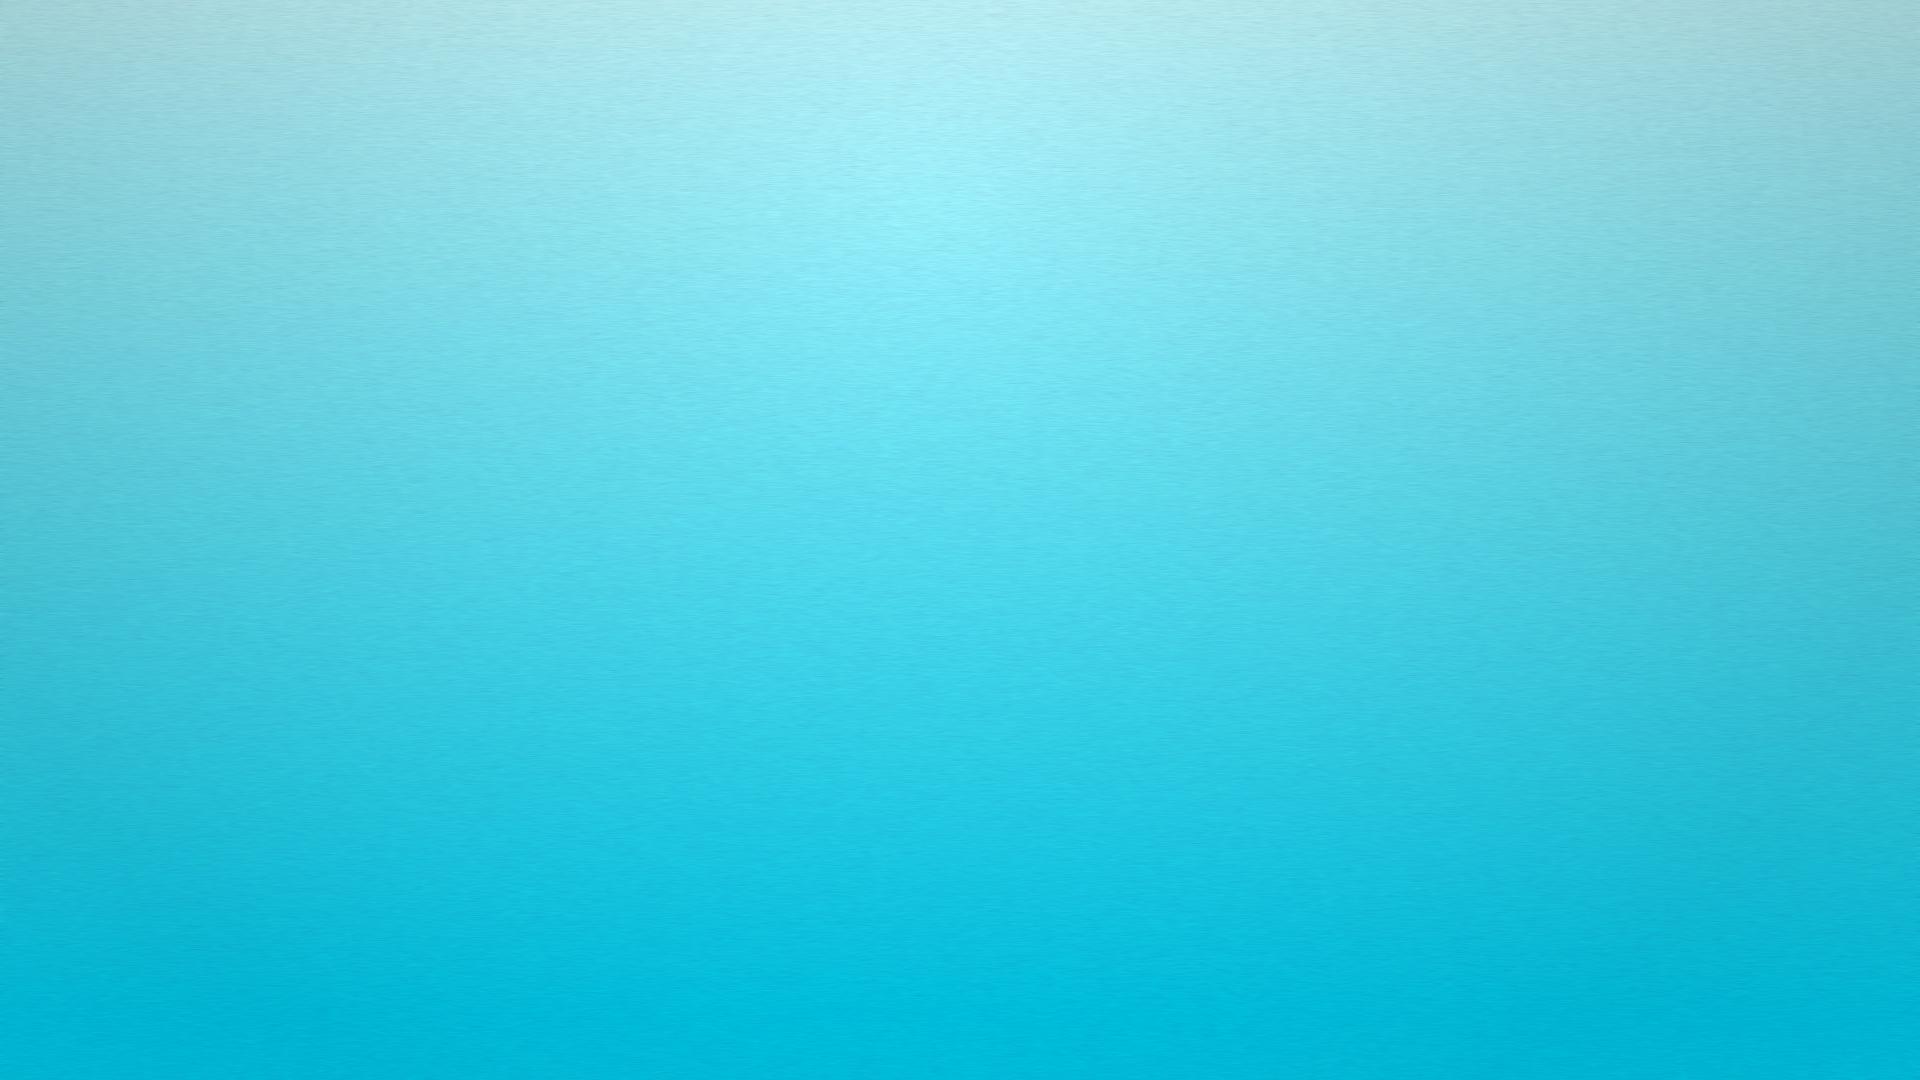 light-blue-wallpapers-free-For-Desktop-Wallpaper